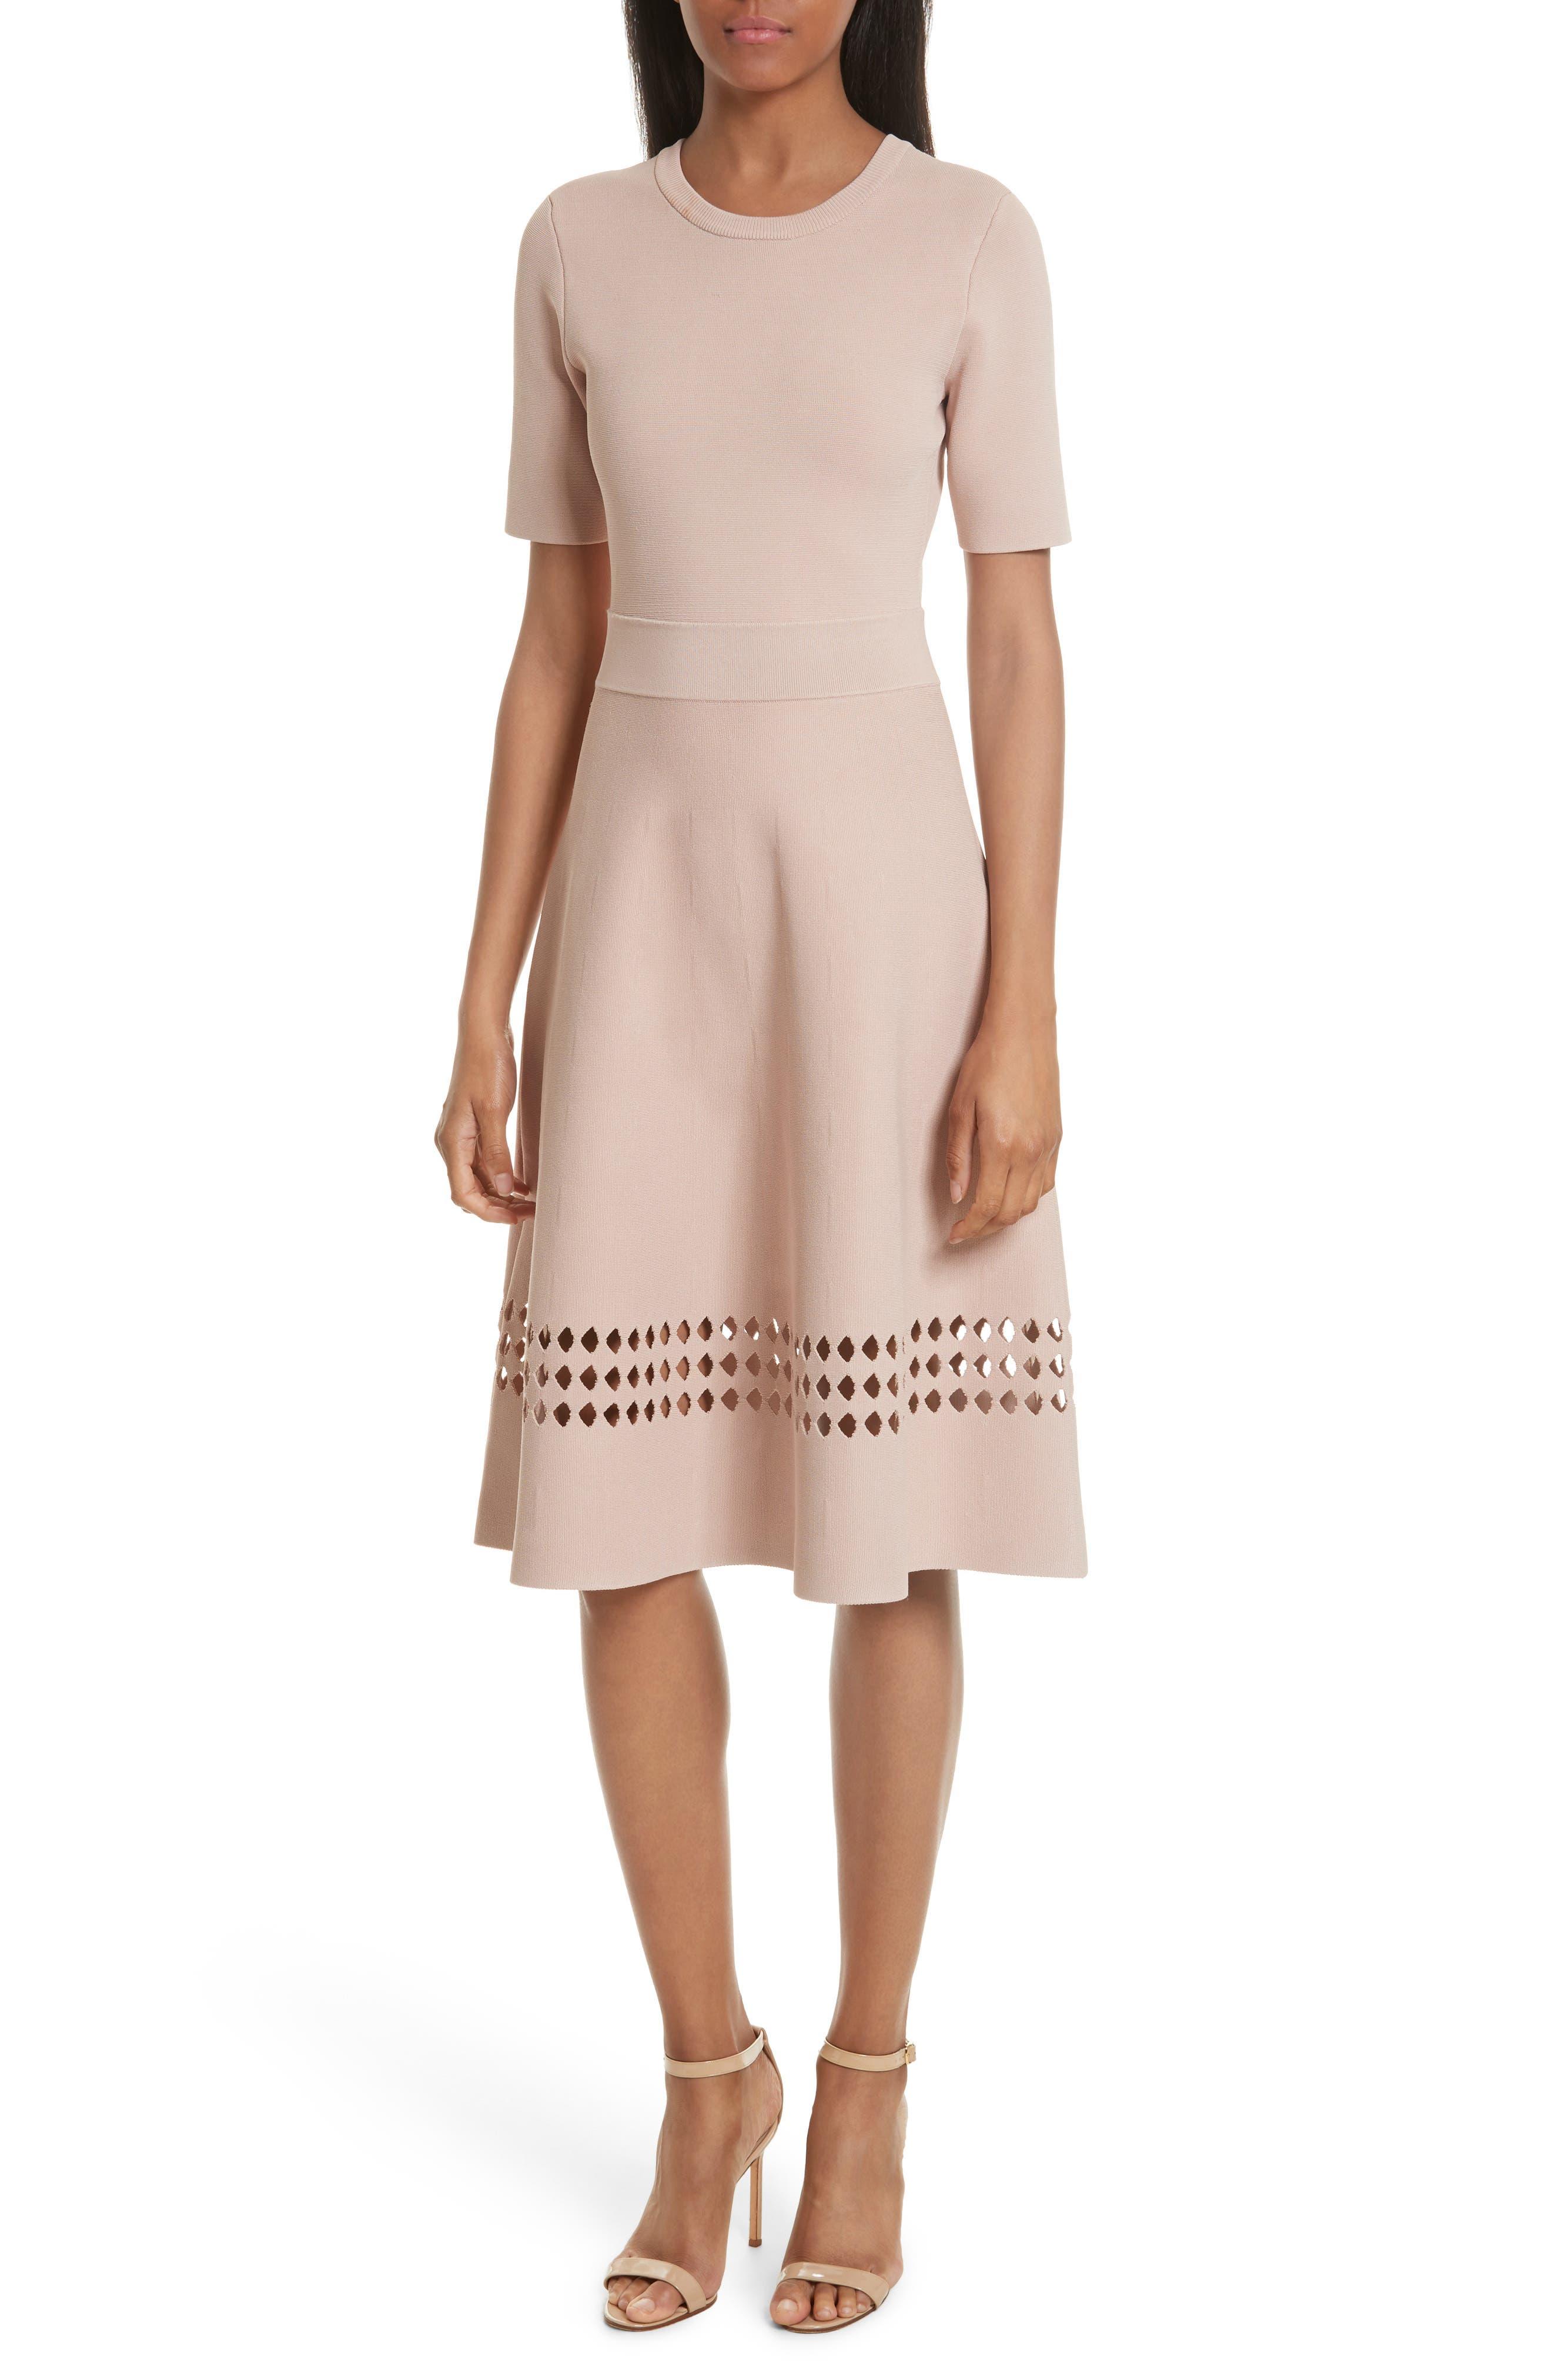 A.L.C. Sara Cutout Dress